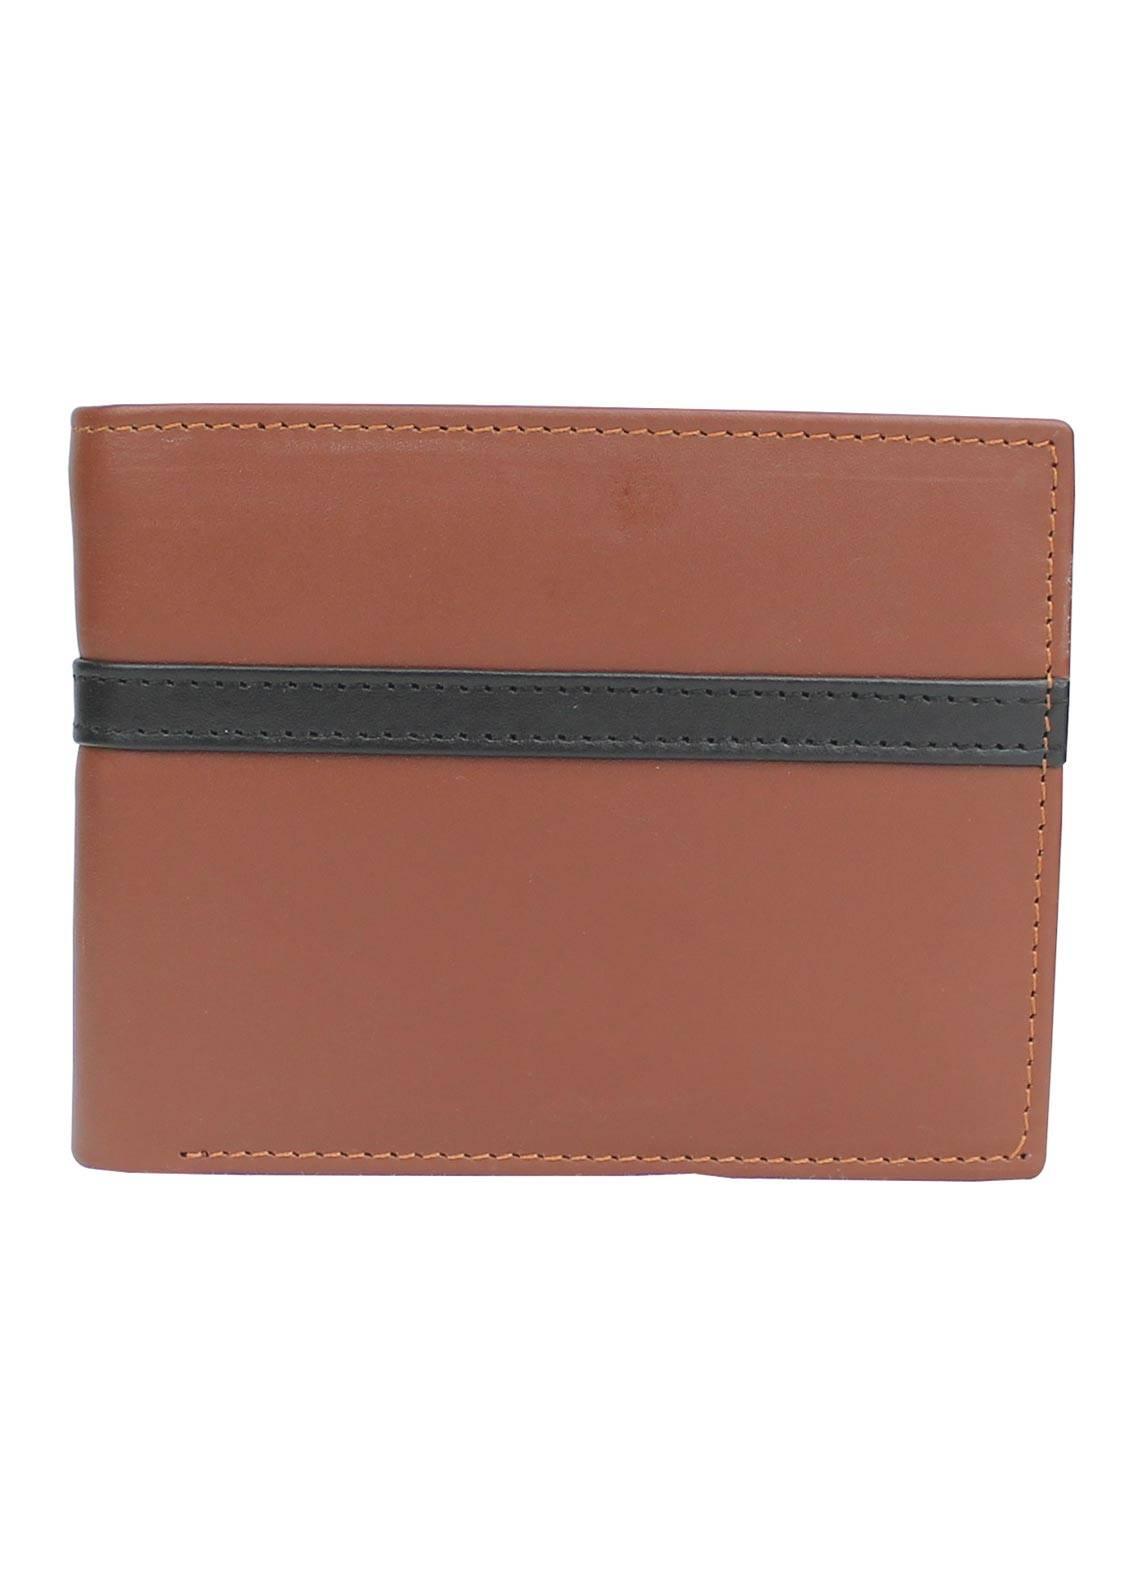 Shahzeb Saeed Plain Texture Leather  Wallet W-082 - Men's Accessories